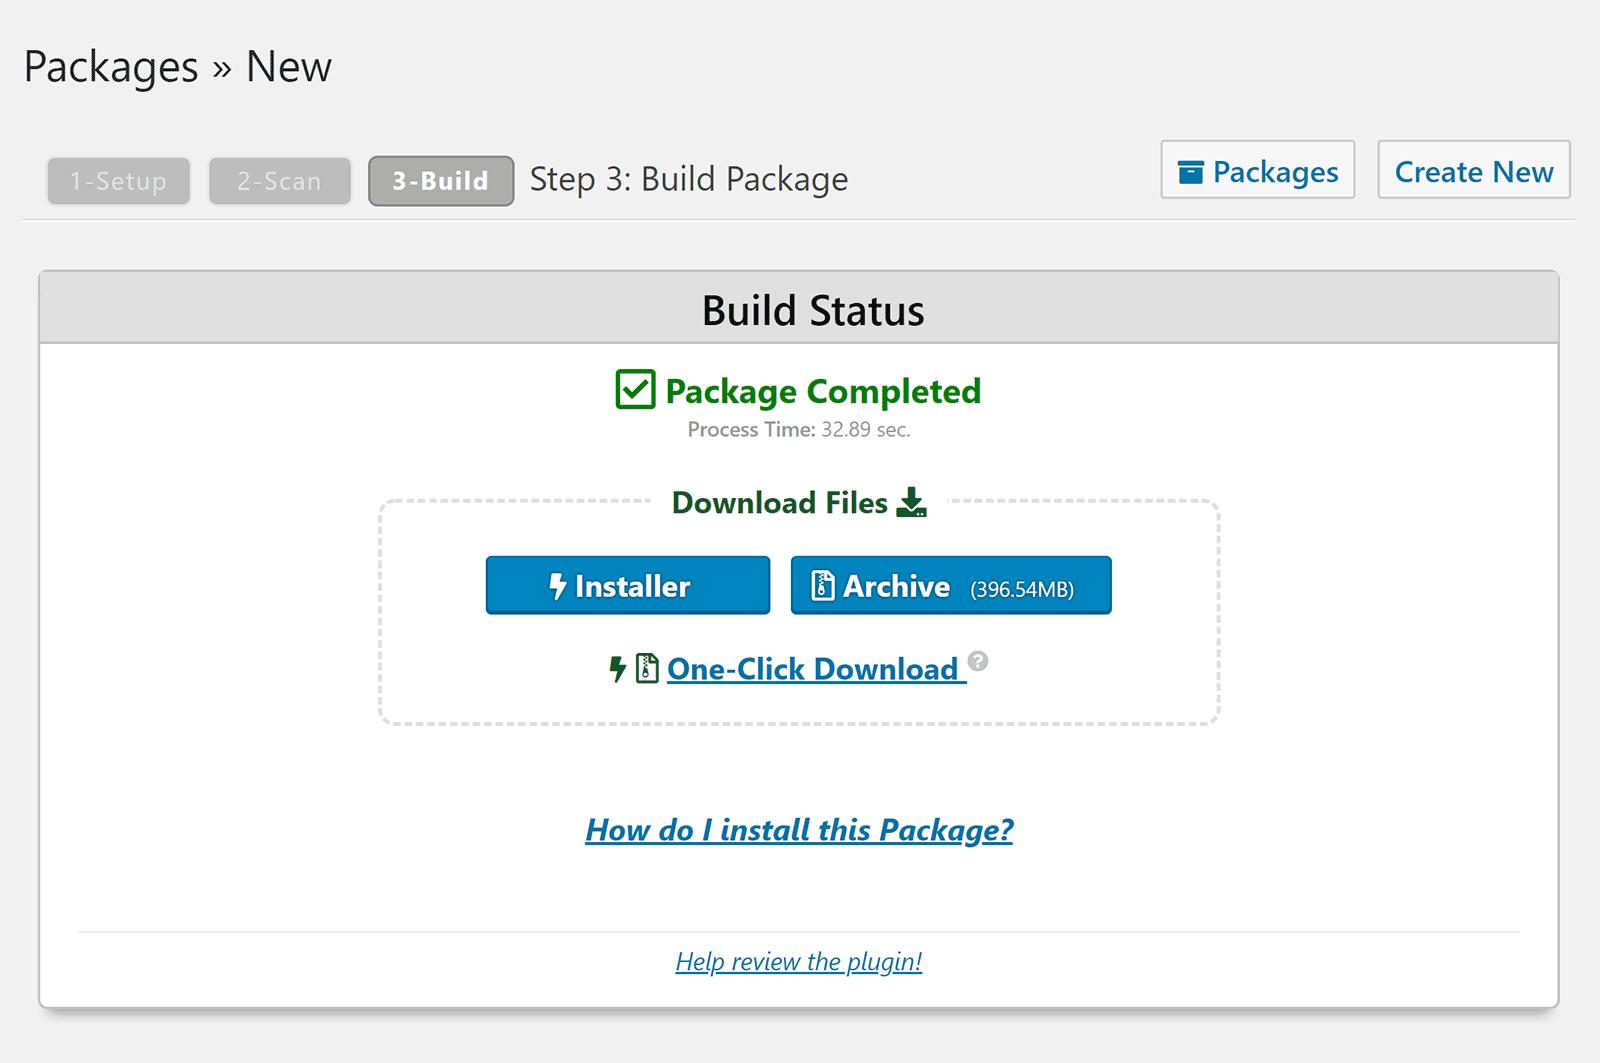 Dublikat paketi tamamlandı